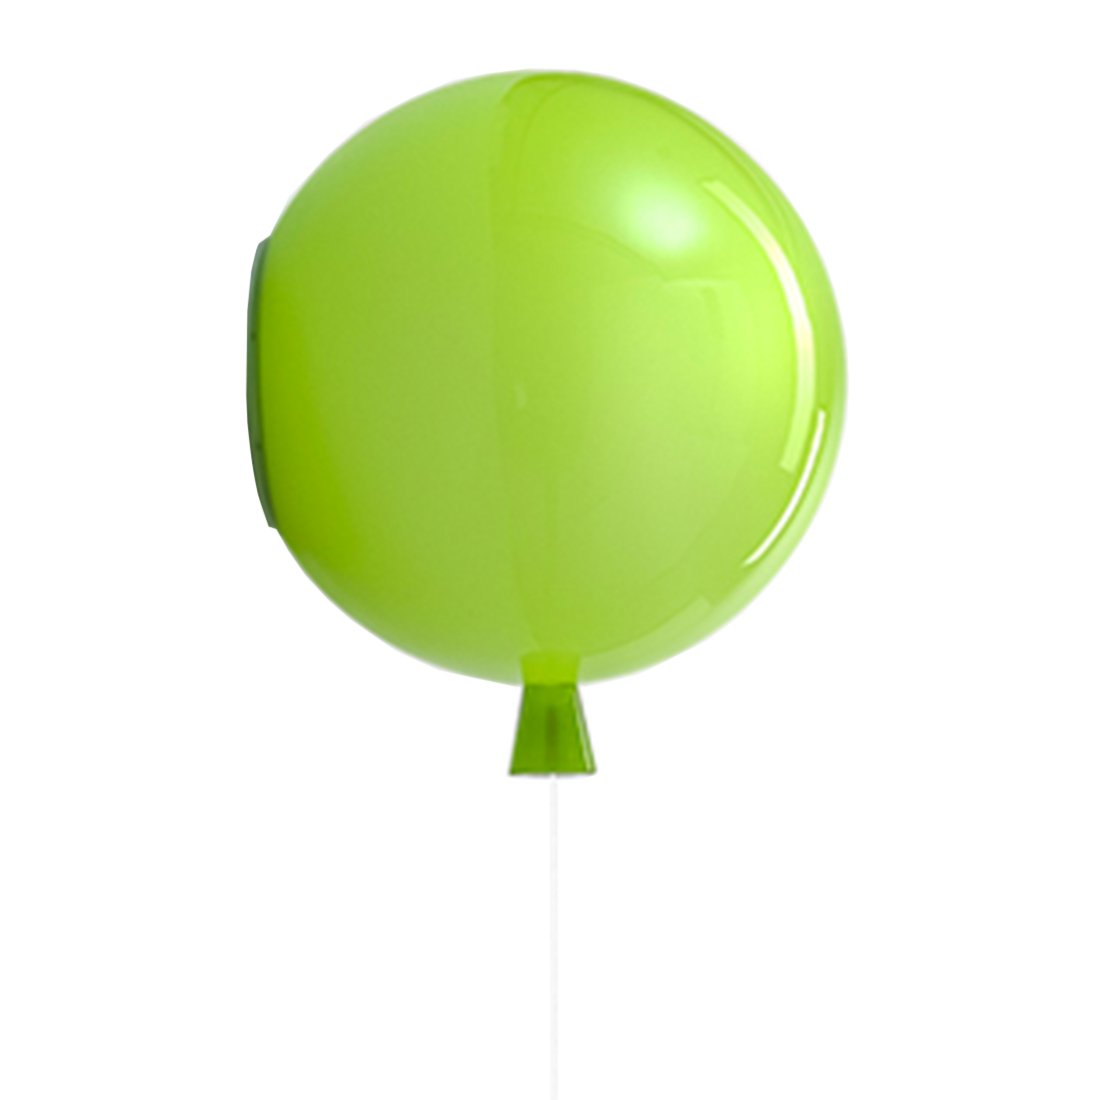 Brokis Memory Wandlamp Large Glossy Groen